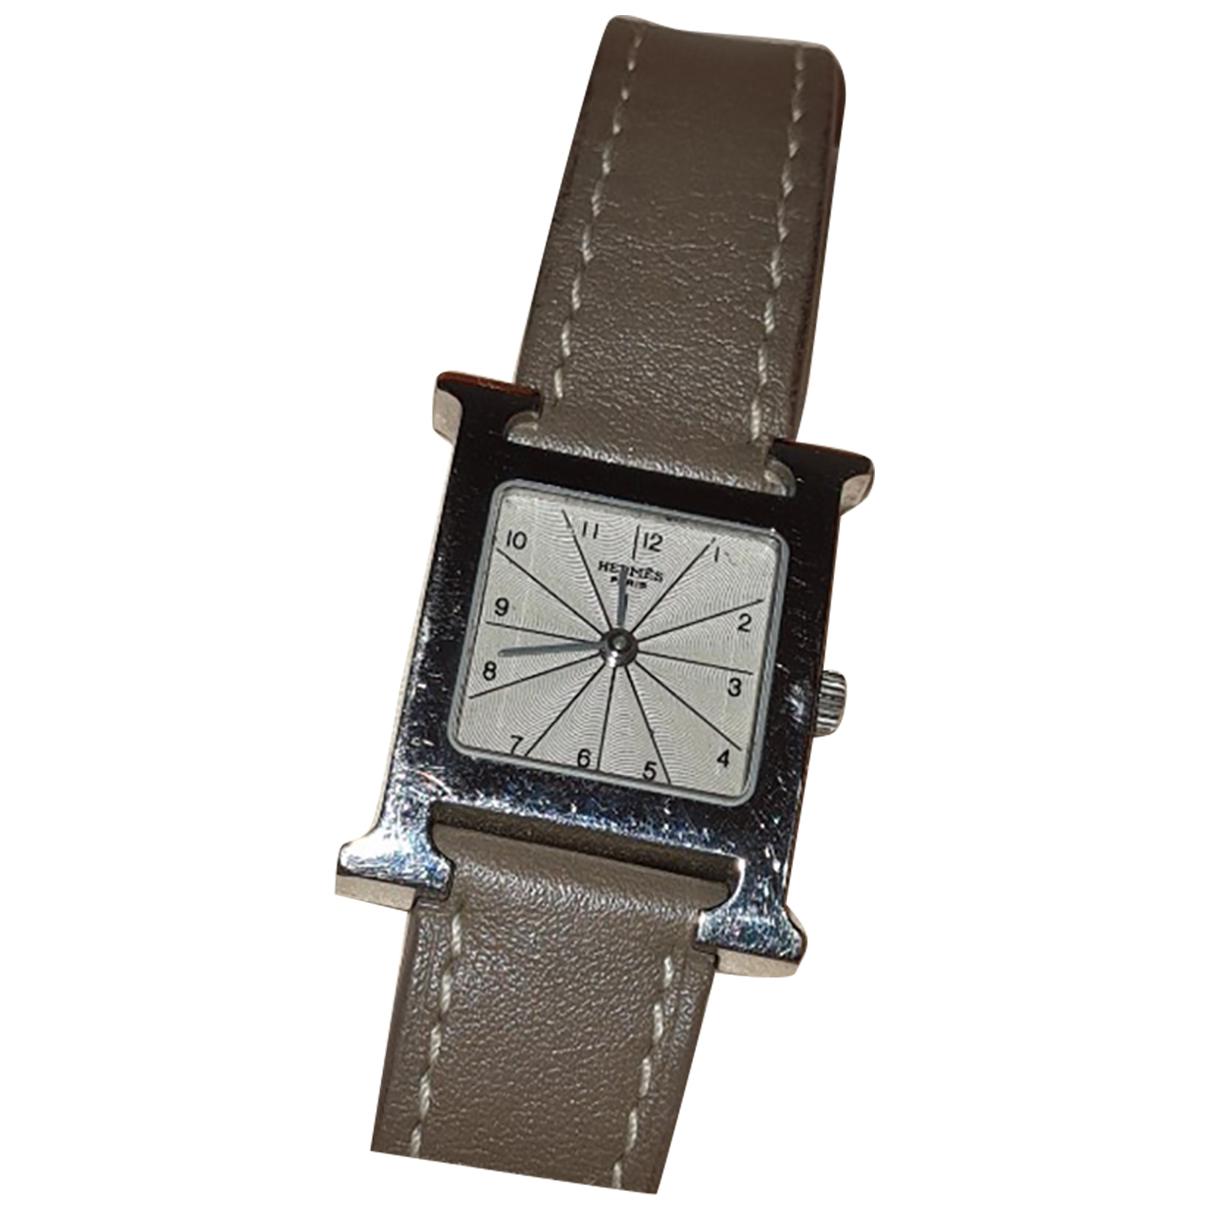 Hermes Heure H Uhr in  Silber Stahl